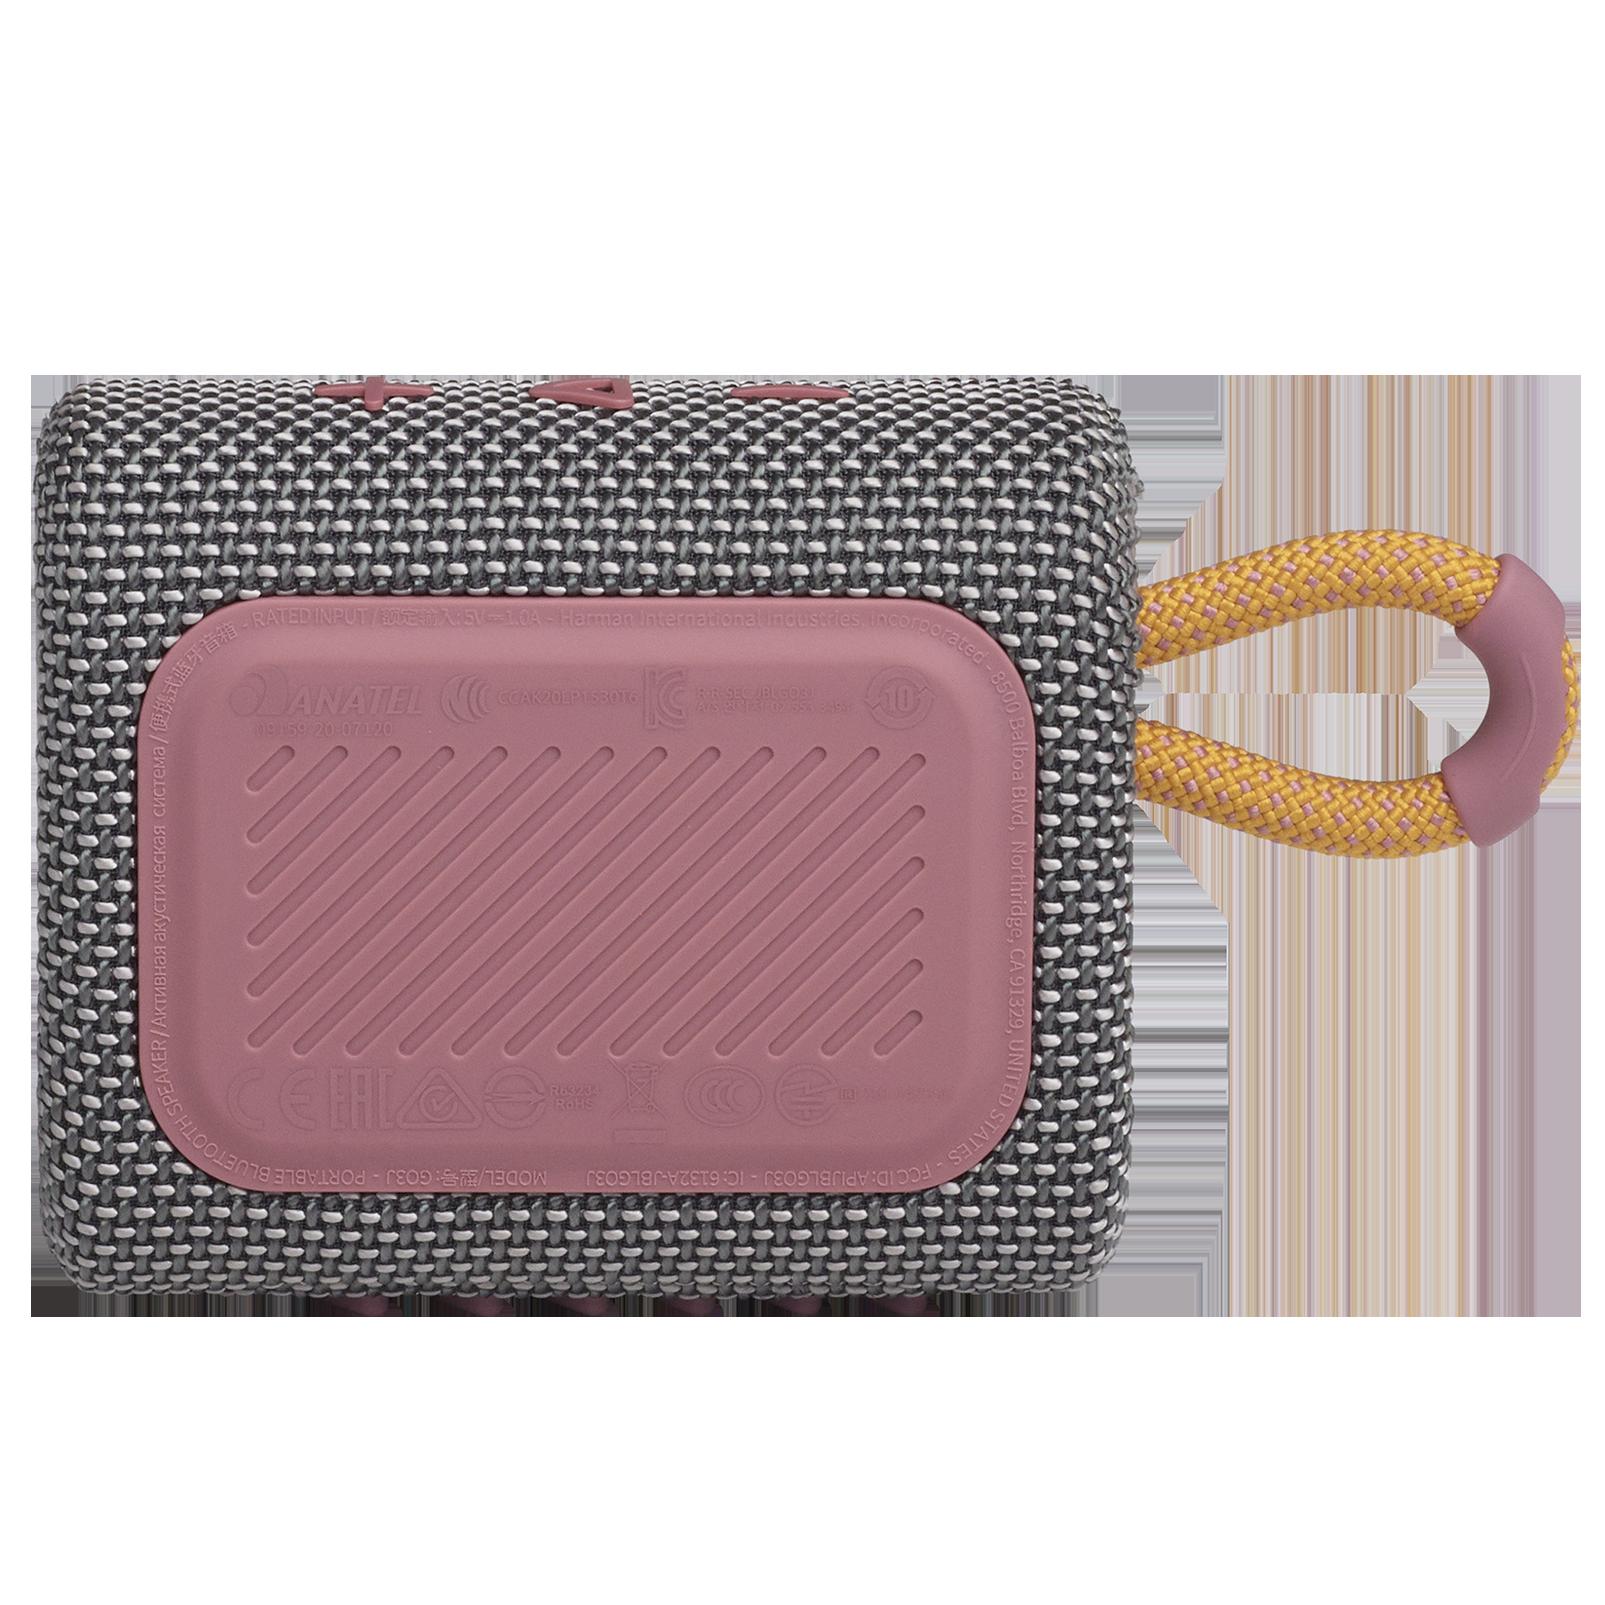 JBL Go 3 - Grey - Portable Waterproof Speaker - Back